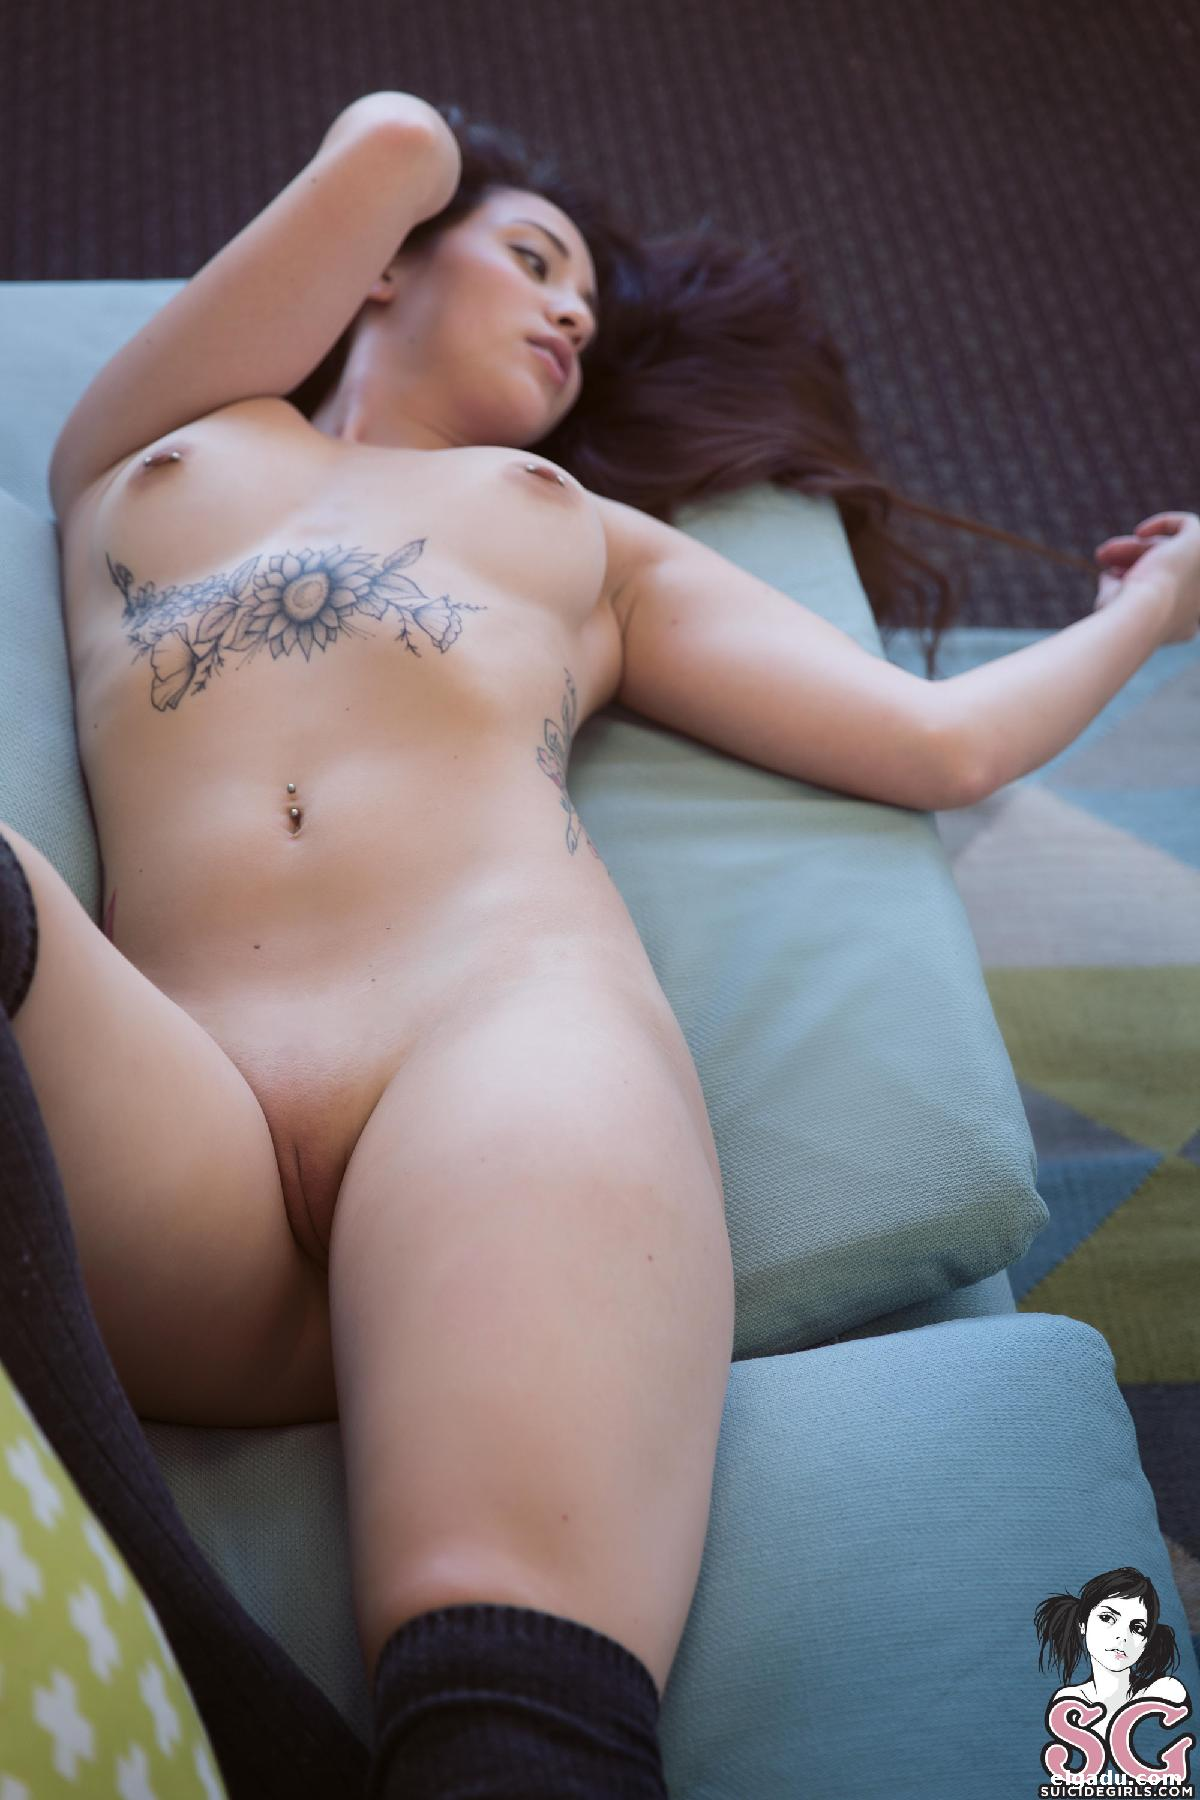 hilary duff sex fake